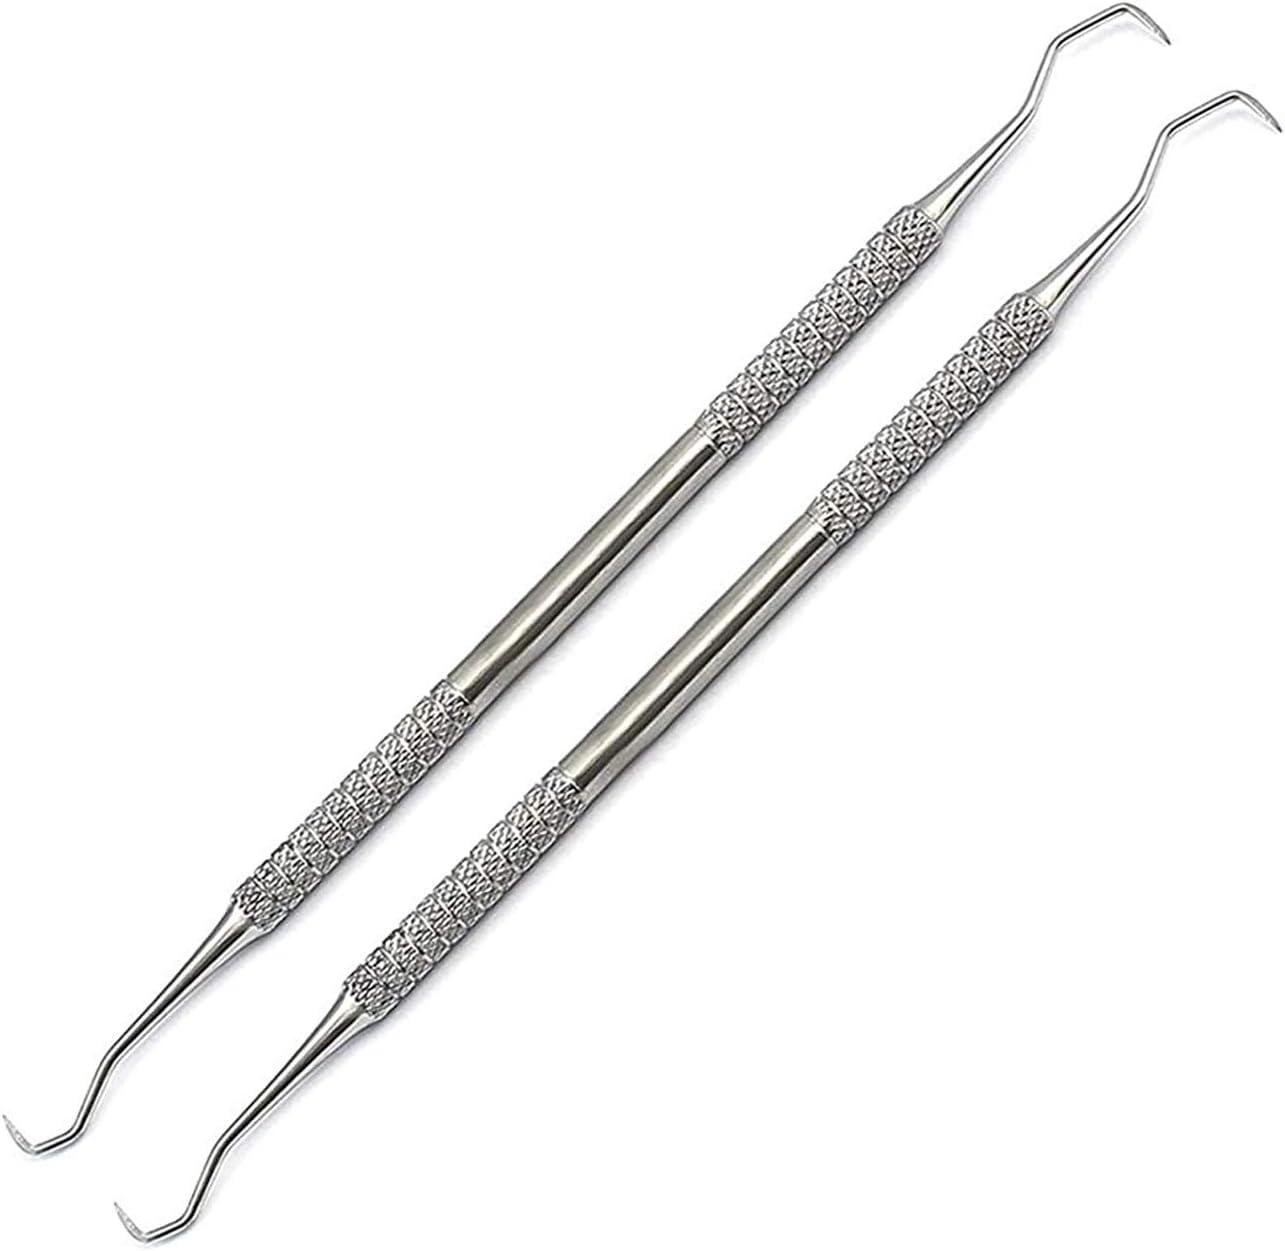 Precise Max 57% OFF Canada Set of 2 Sale item Pcs Dental Anterior Jacq Scaler Sickle